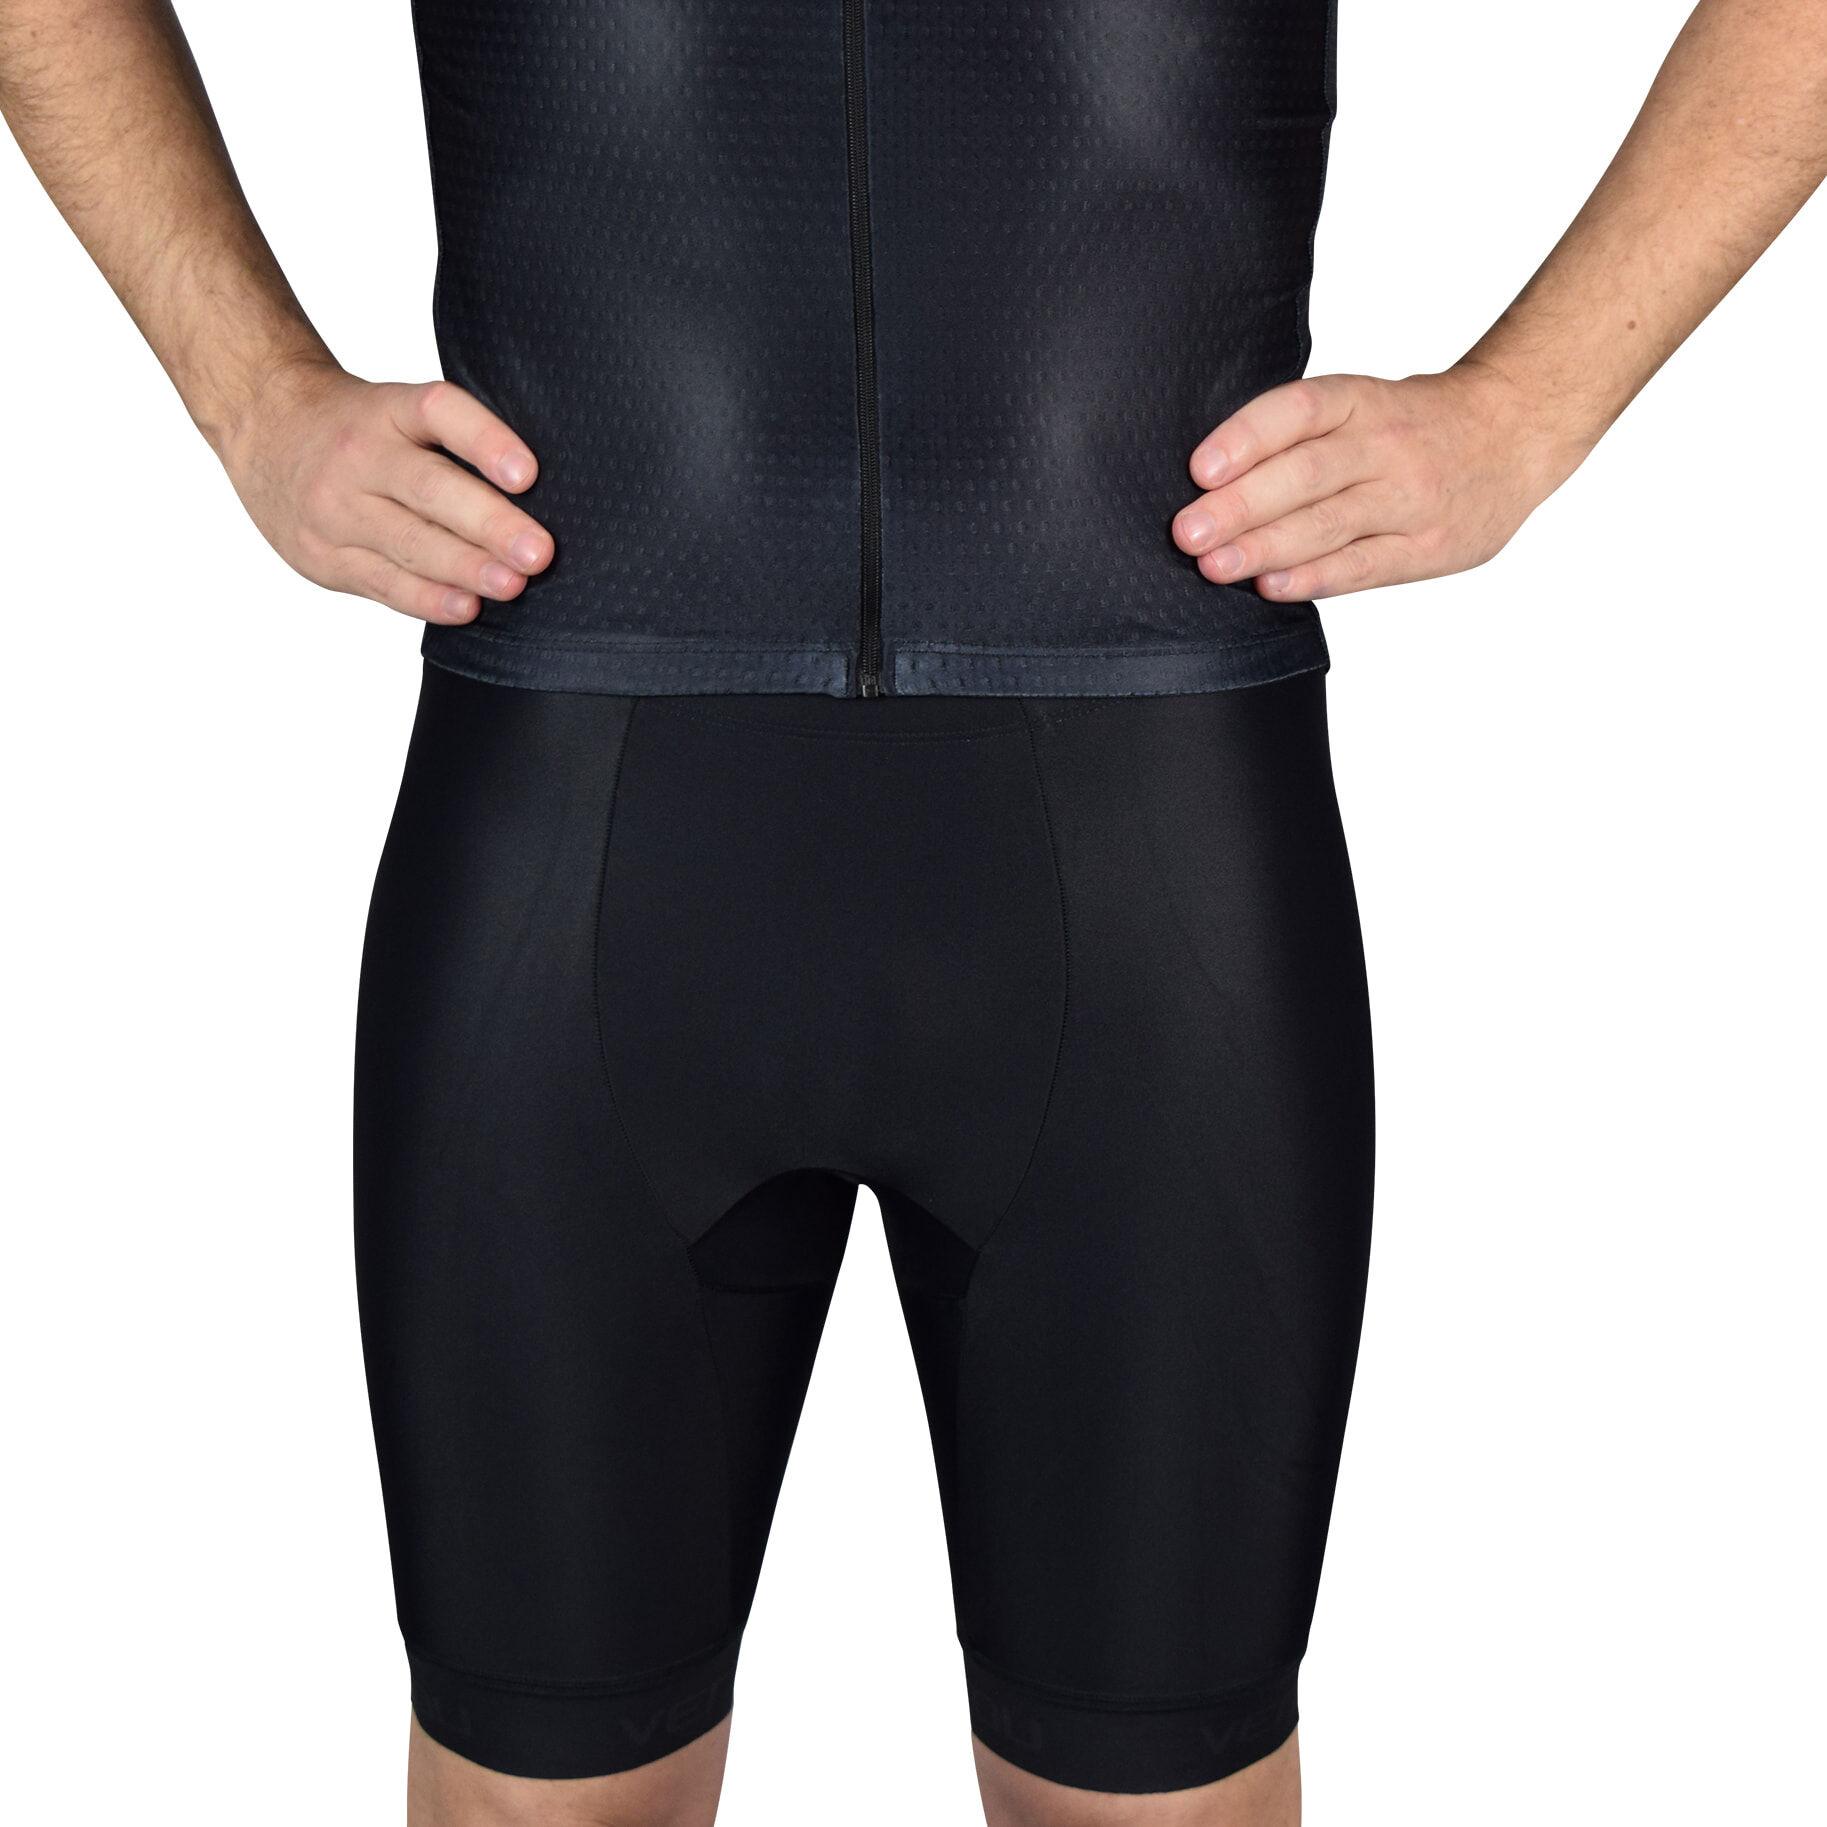 Black Tri Shorts Front